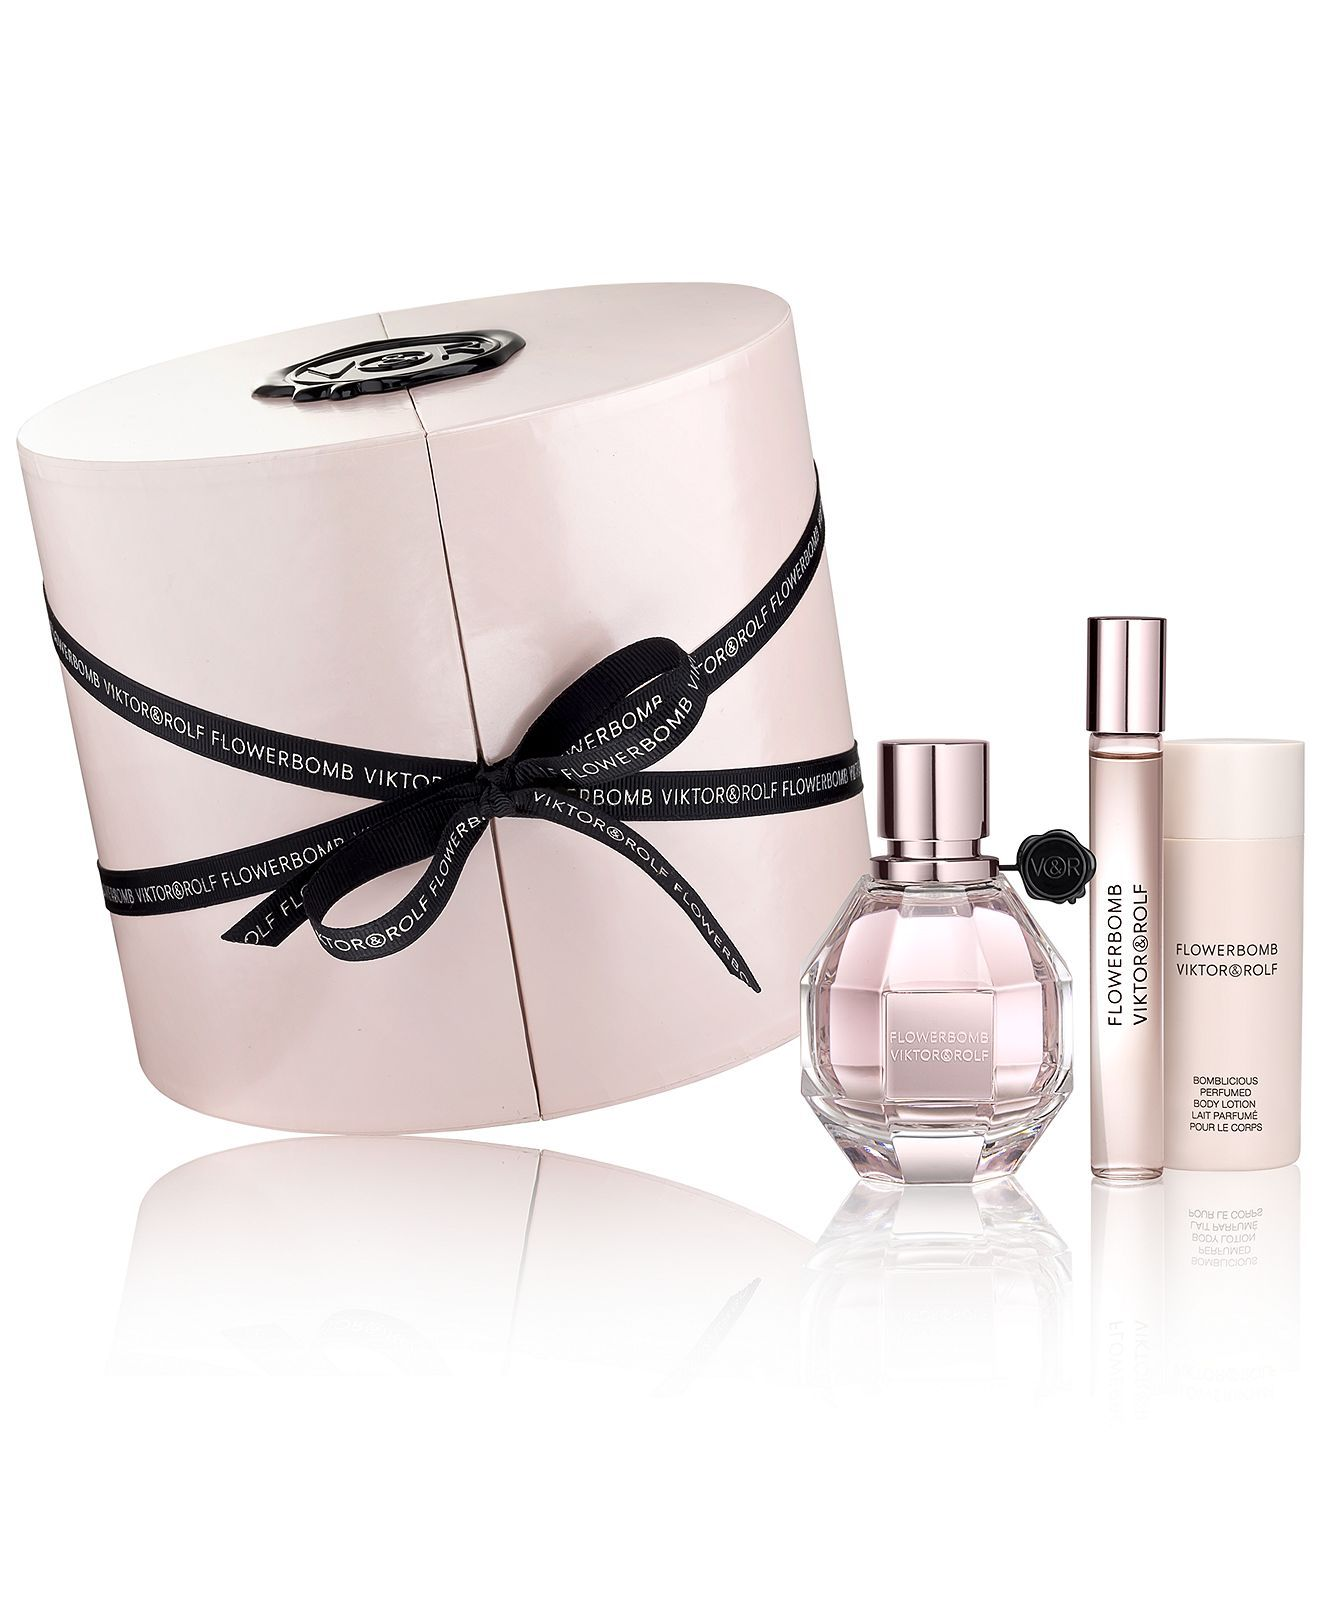 f6b7e1889a6f Viktor   Rolf Flowerbomb Gift Set - Perfume - Beauty - Macy s ...